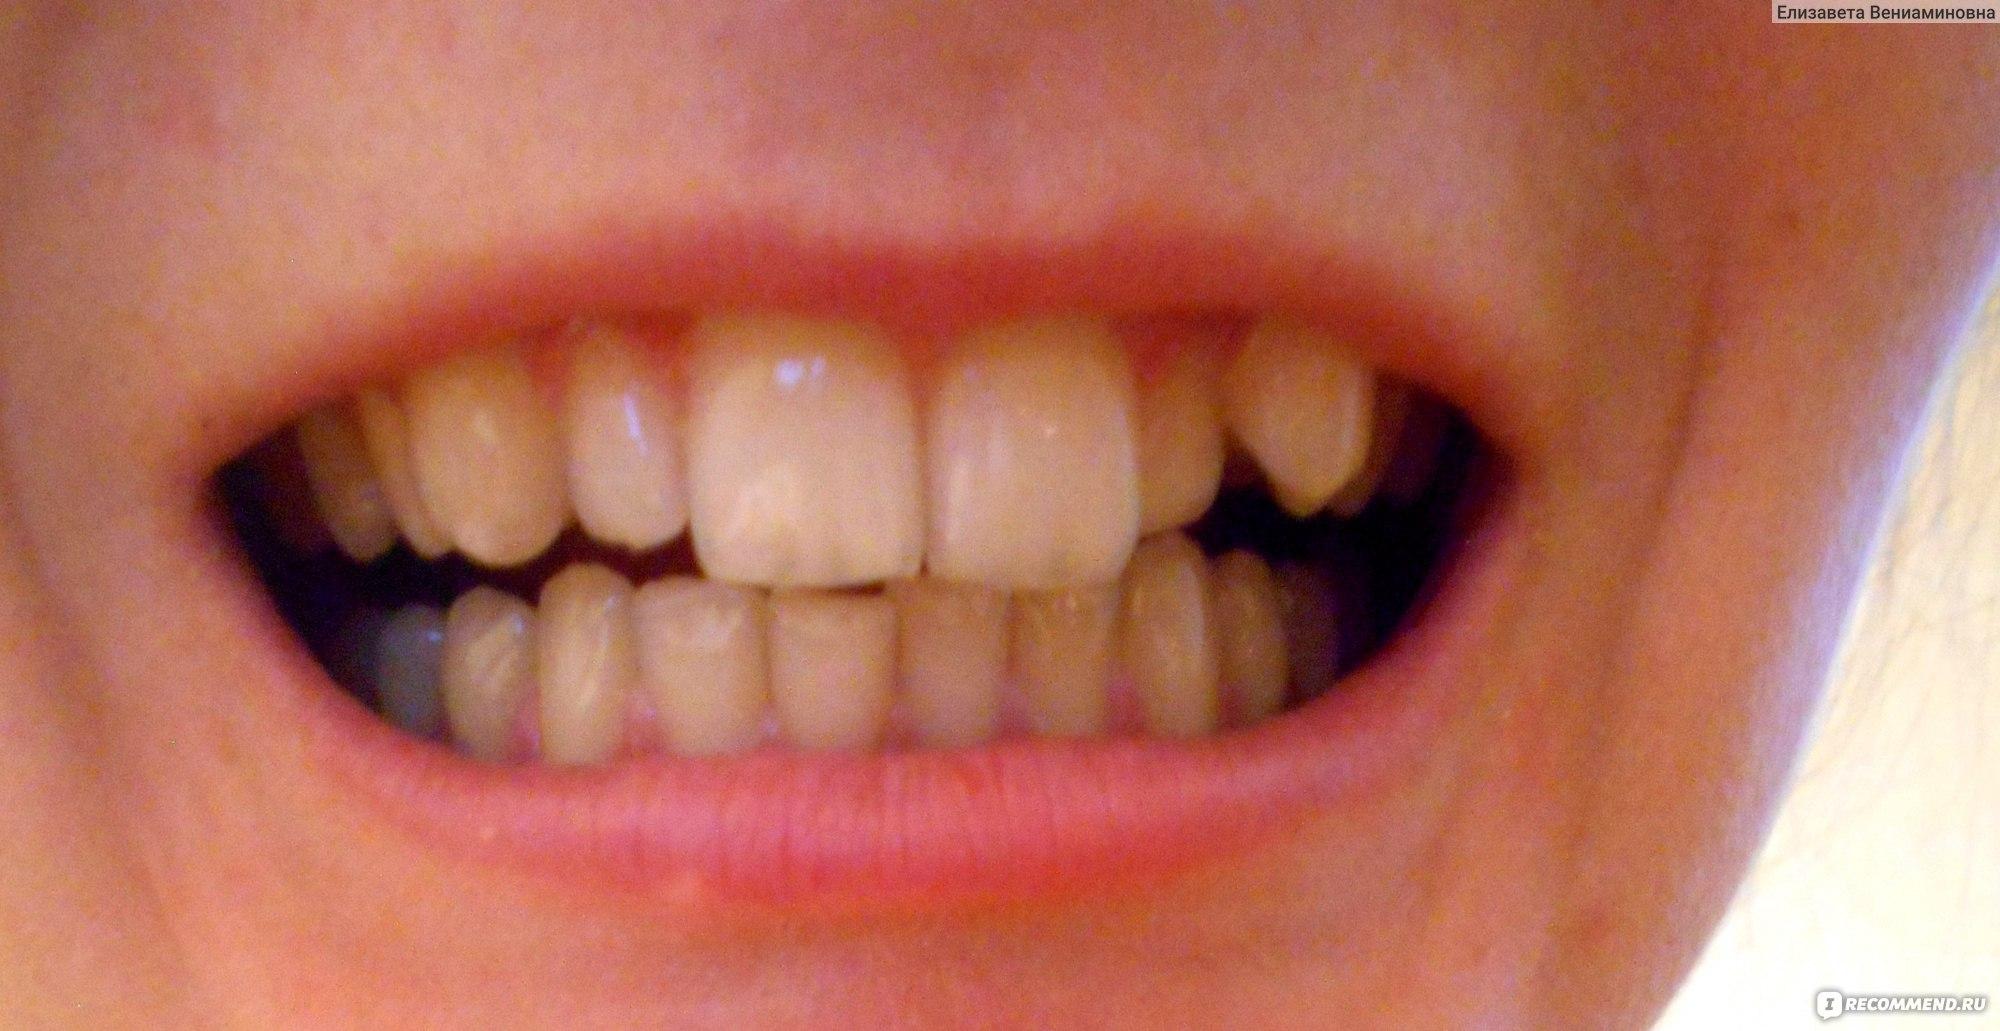 Удалили передний зуб как ходить на работу фриланс текстов